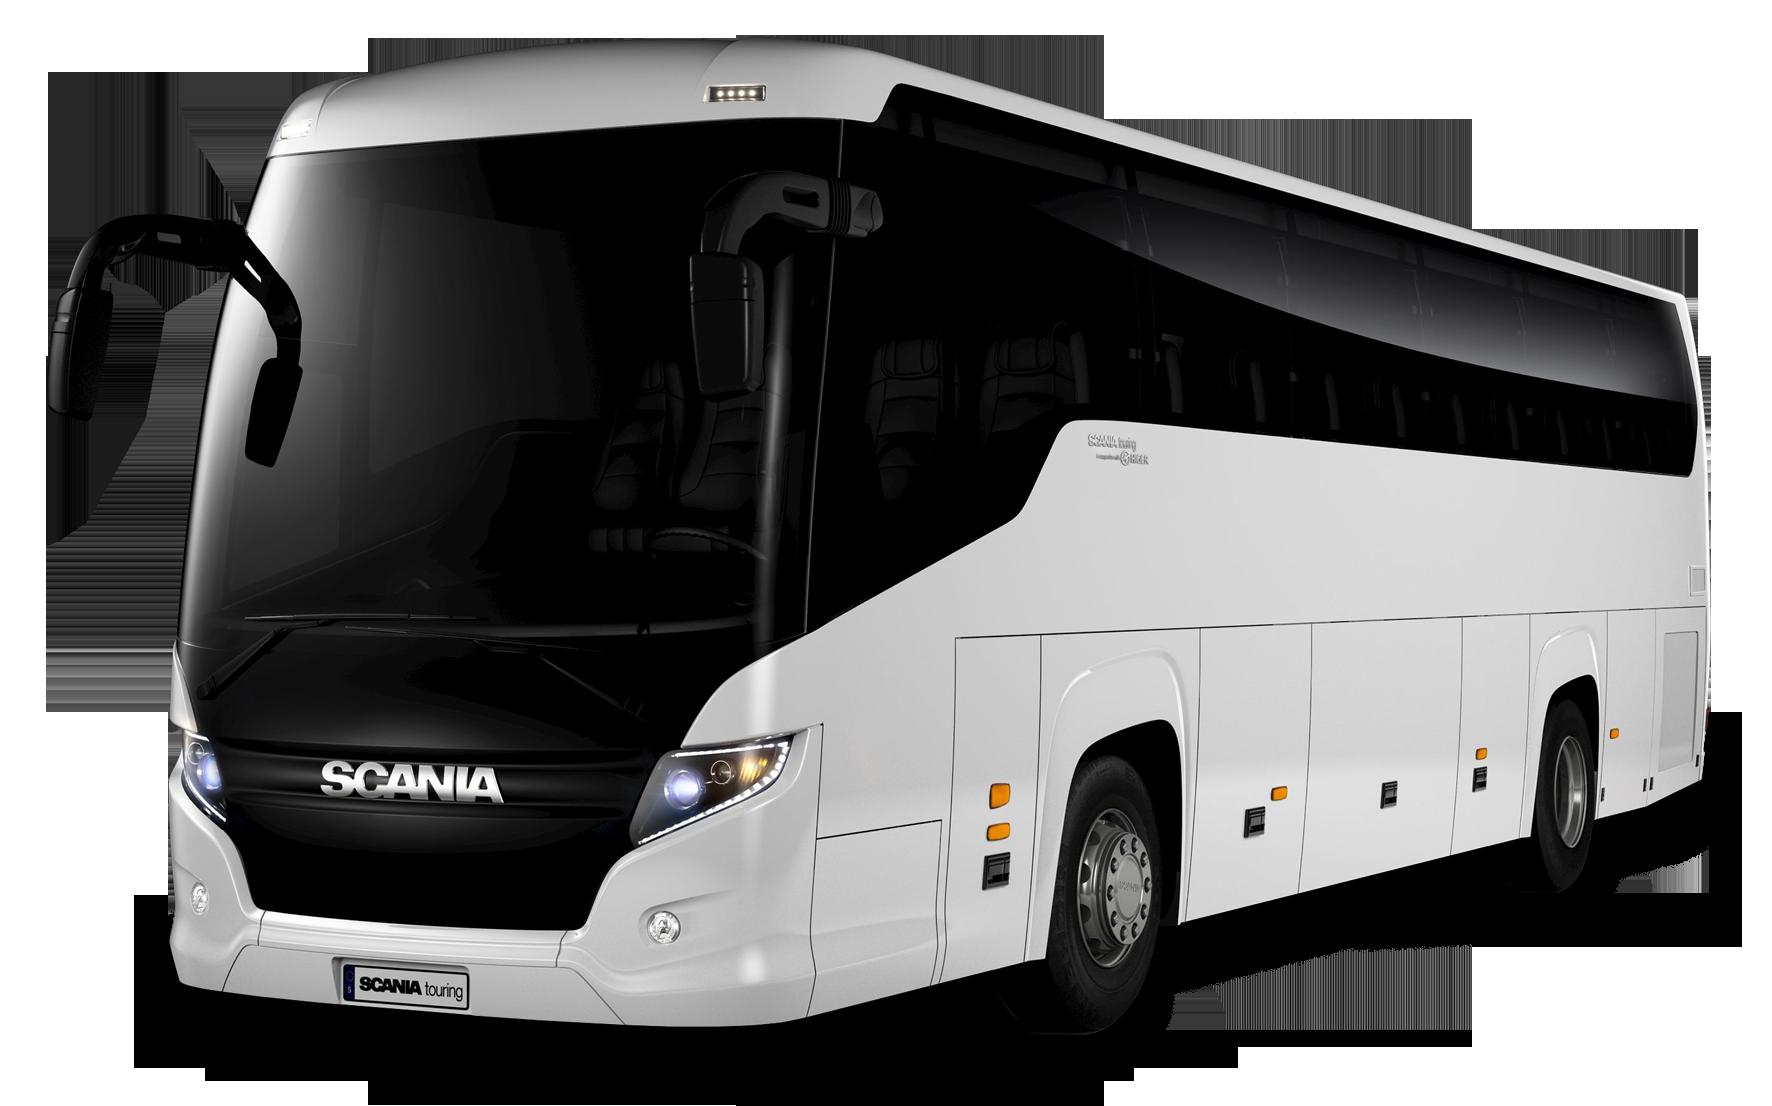 Sewa Mobil di Batam | Sewa Mobil Bus di Batam